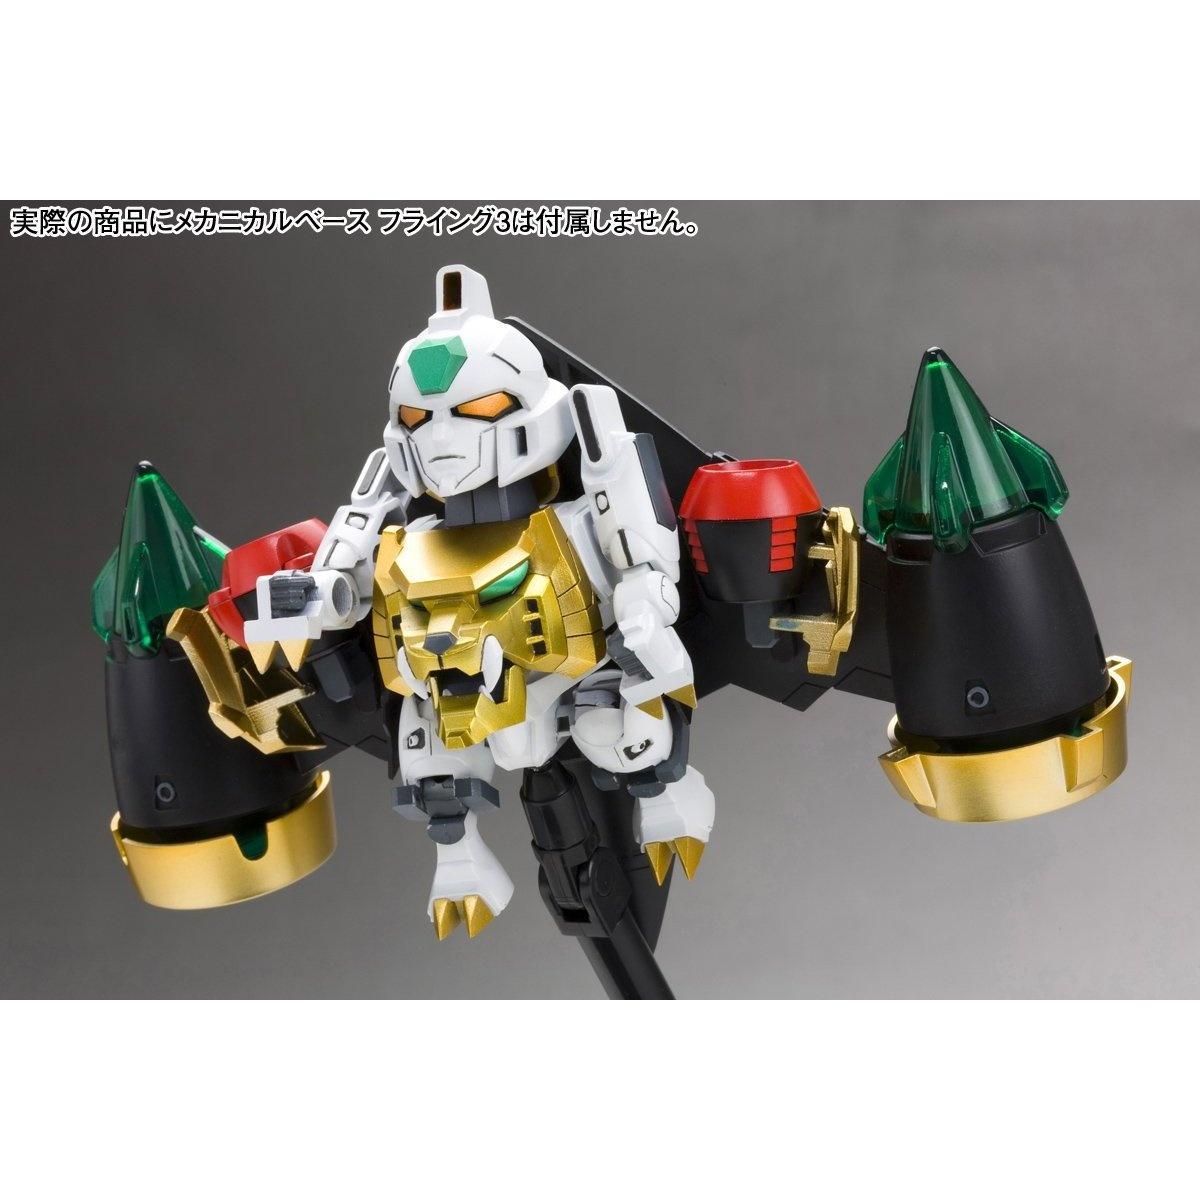 Kotobukiya-The-King-Of-Braves-GaoGaiGar-figurine-Model-Kit-D-Style-Star-Gao